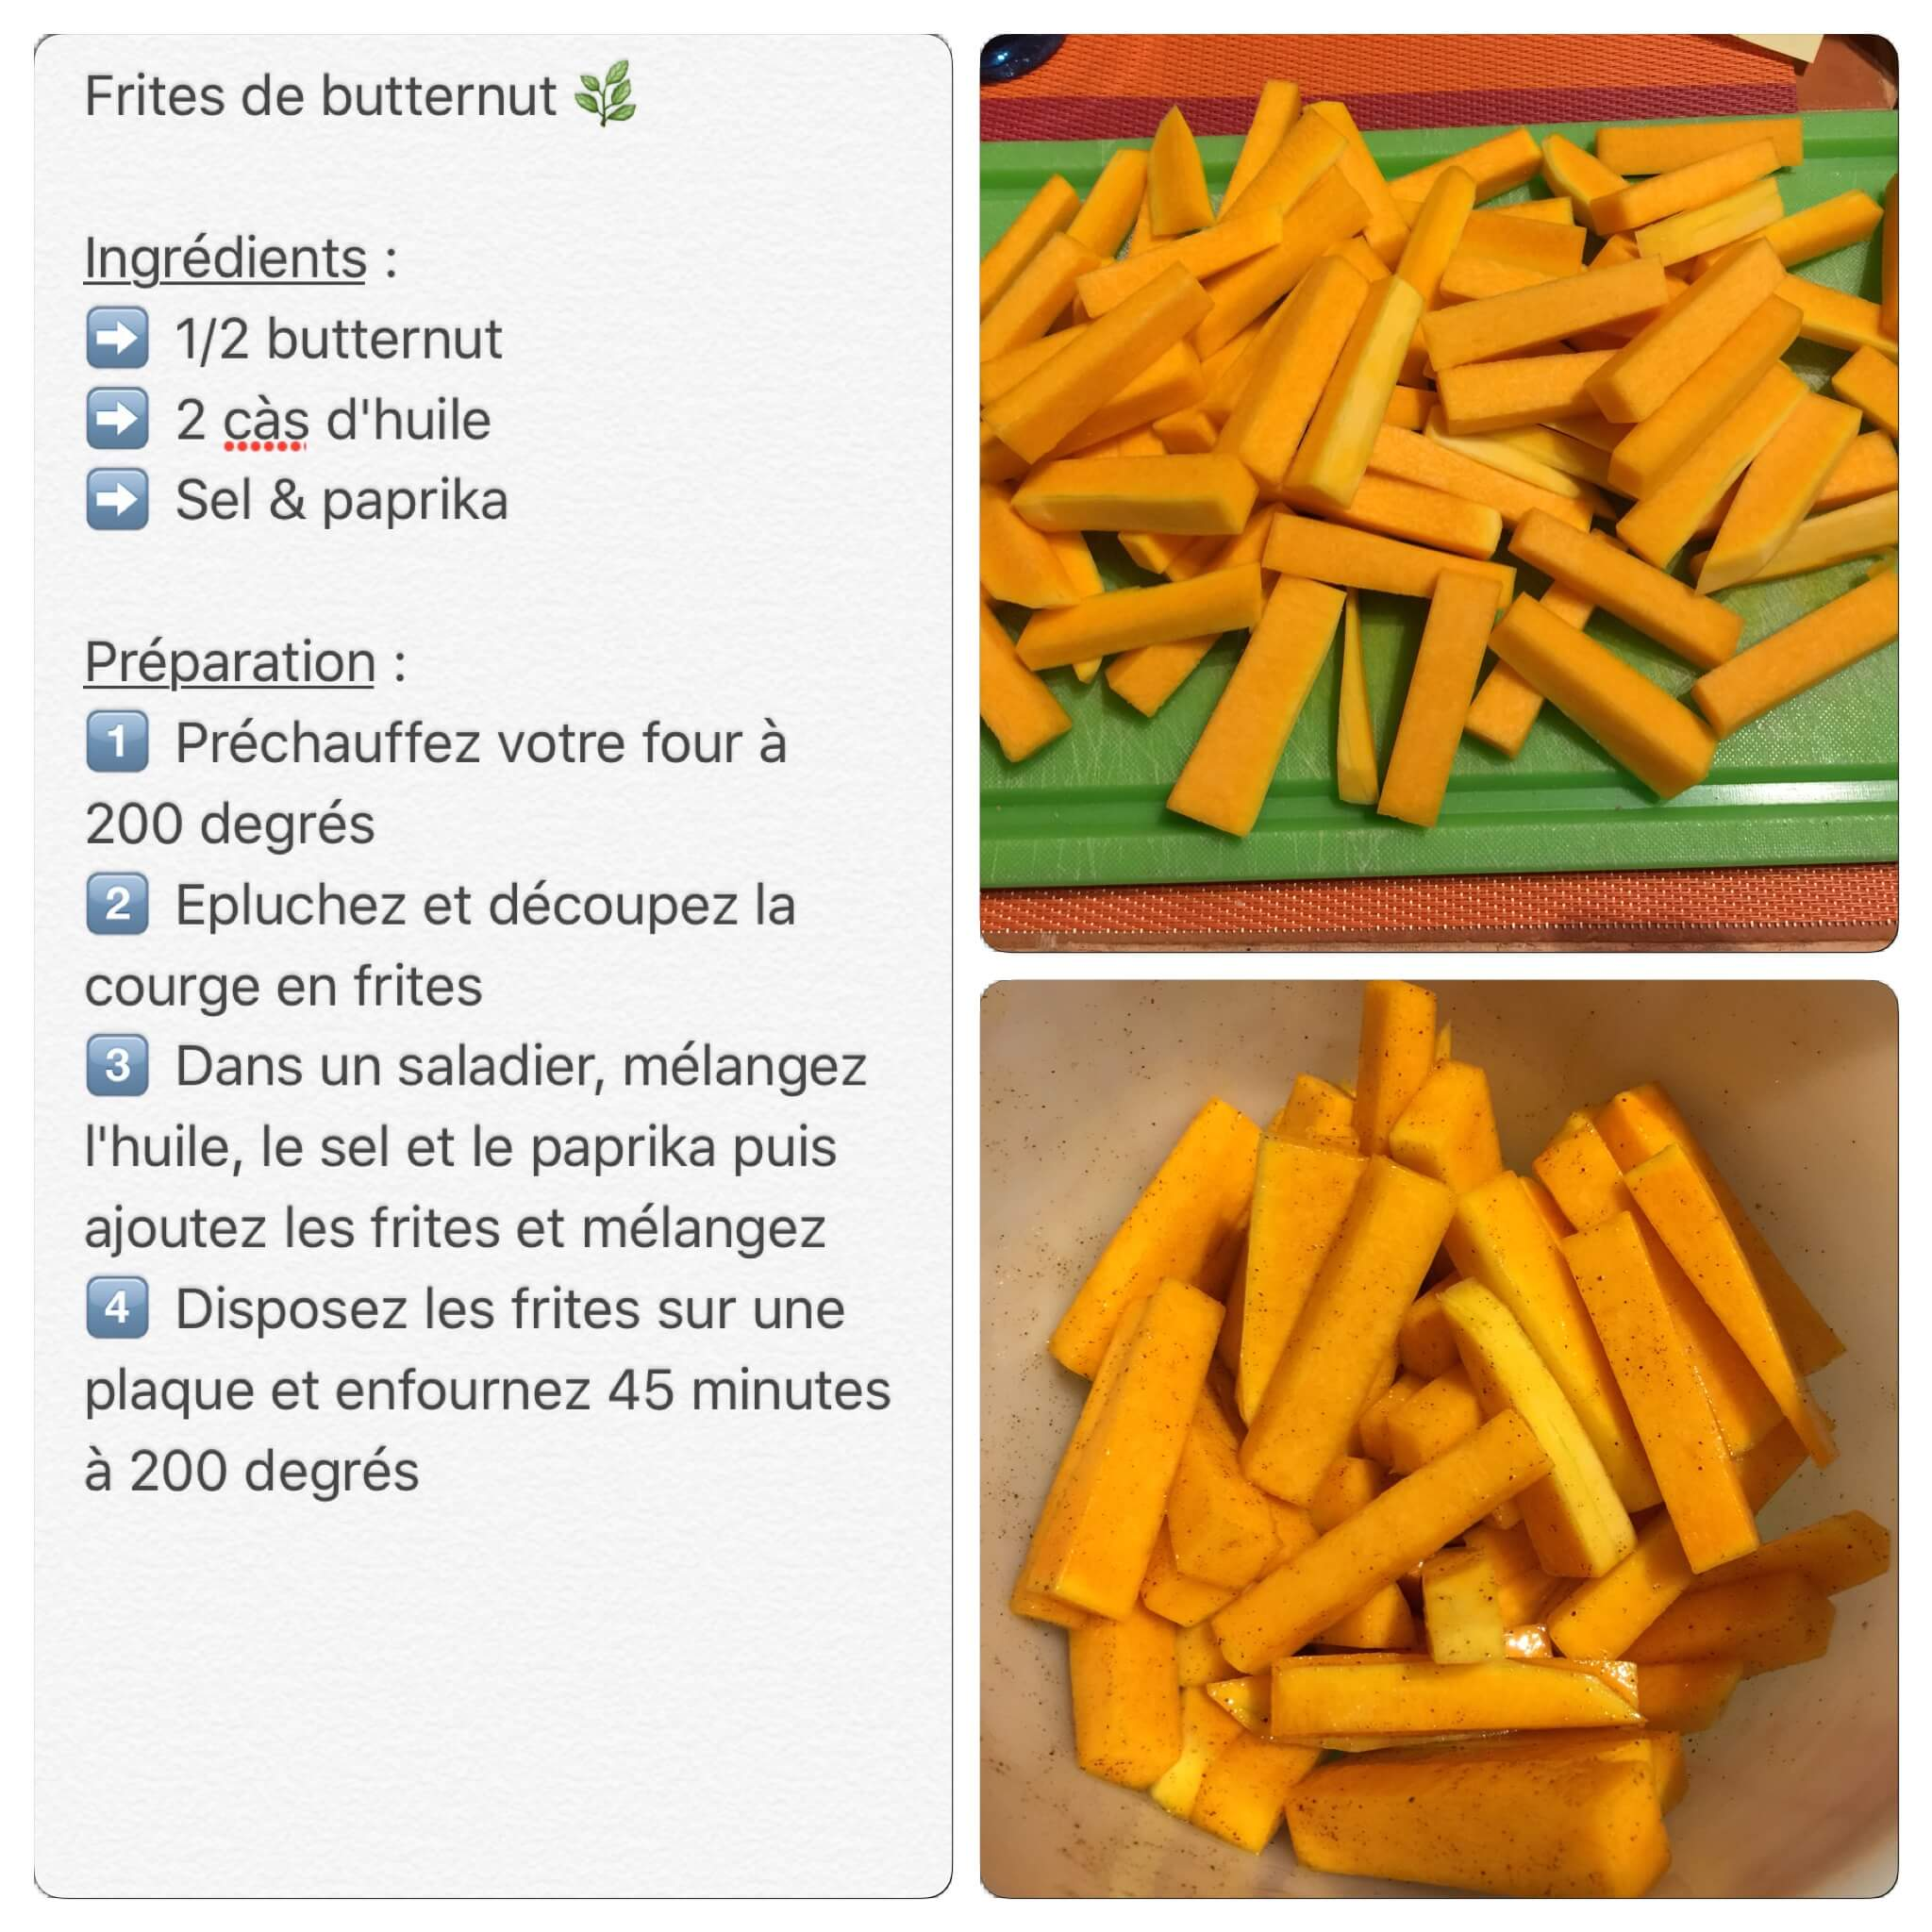 Recette de frites de butternut